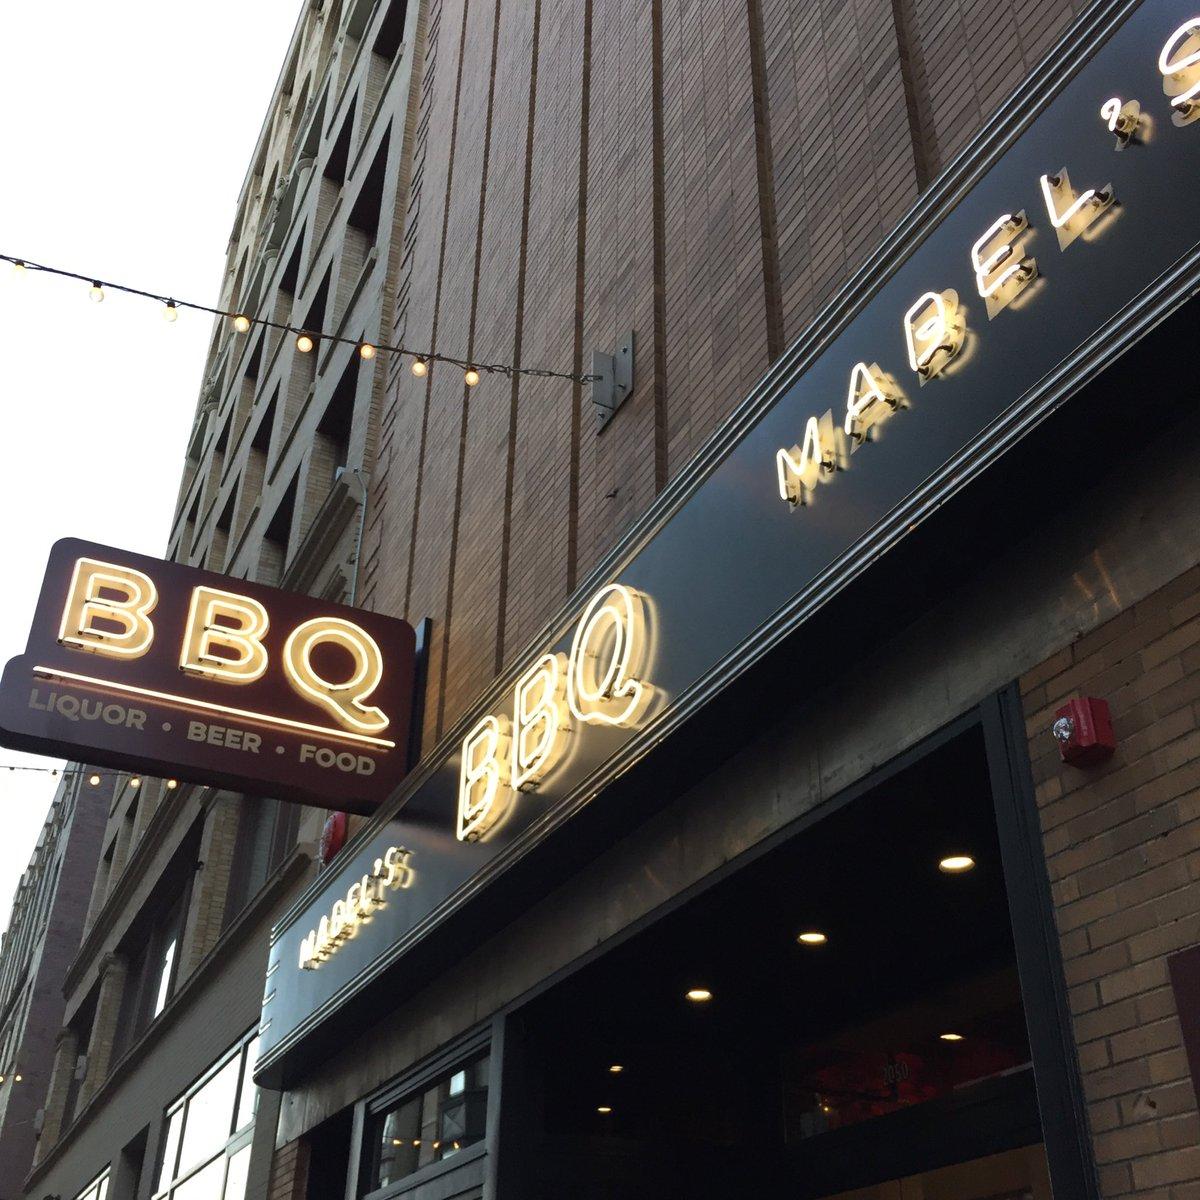 So. Excited. @BBQMabels @chefsymon https://t.co/bJ0PFluQ9o